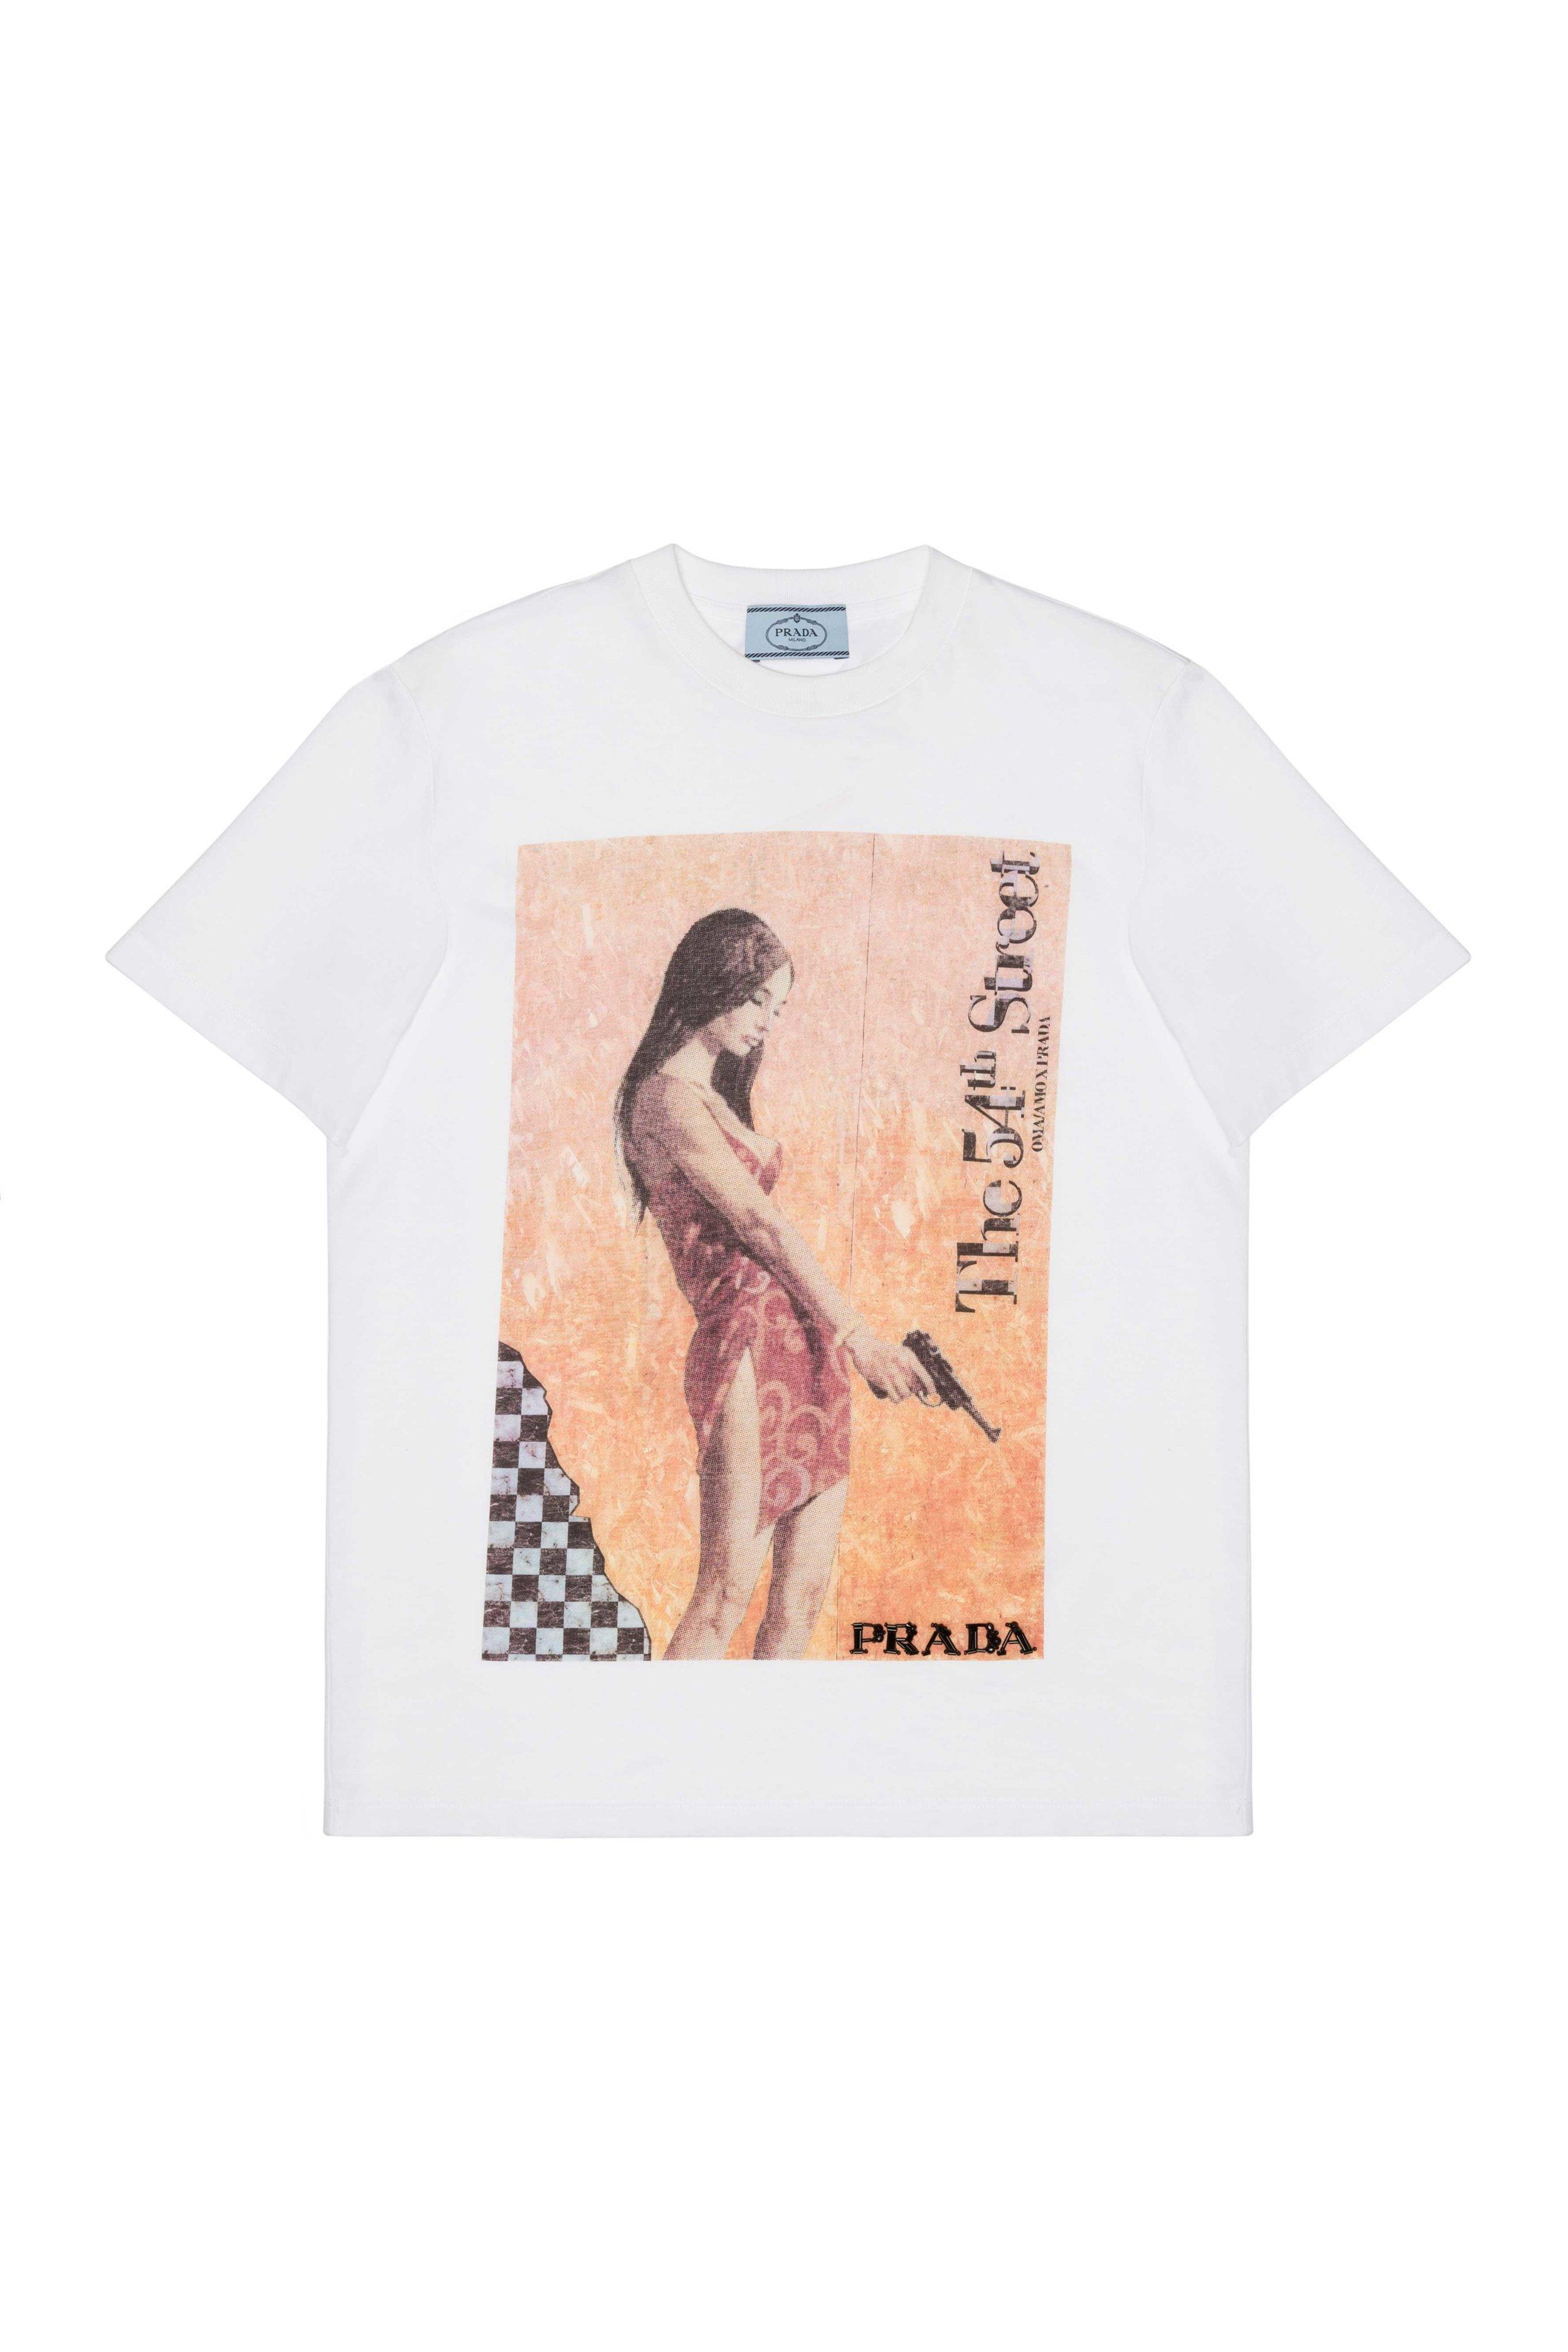 Prada--Poster-Girl-35838RBianco+Albicocca.jpg